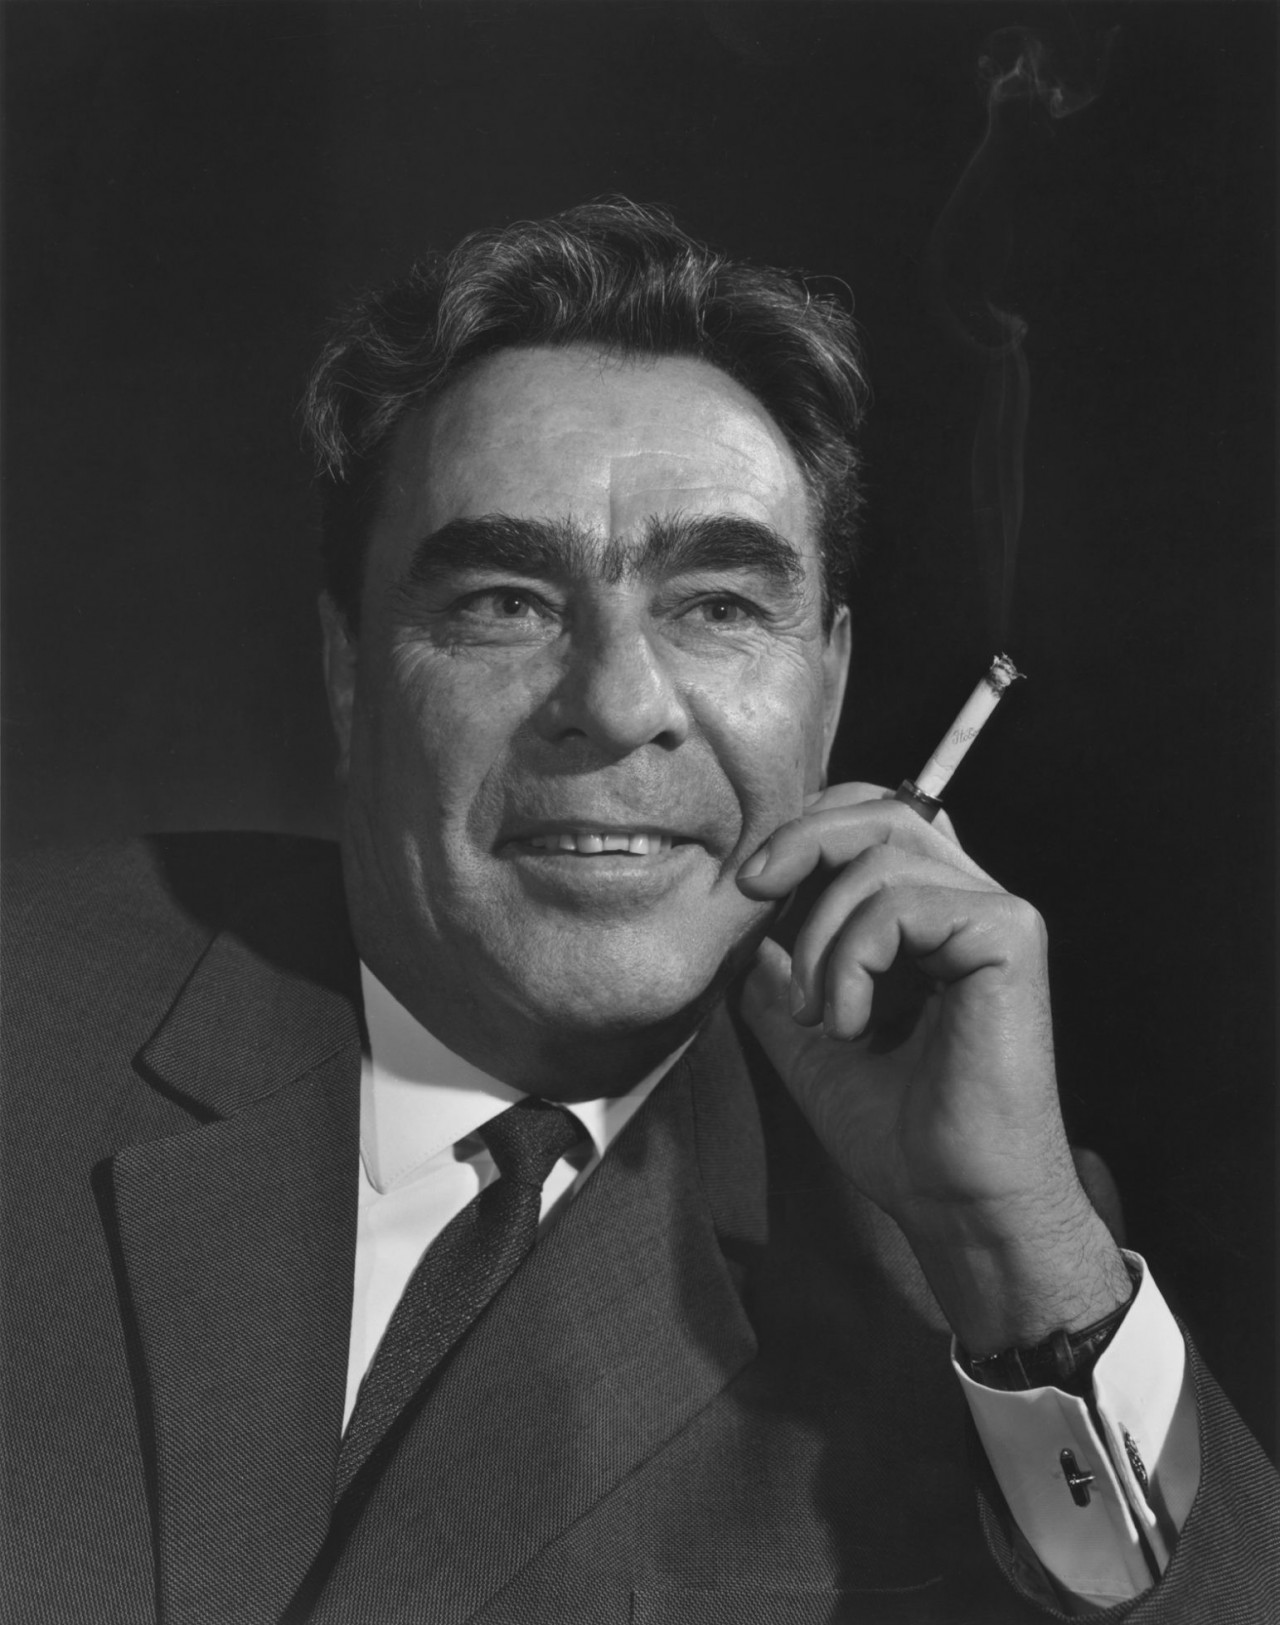 Леонид Ильич Брежнев, Москва, 1963. Автор Юсуф Карш